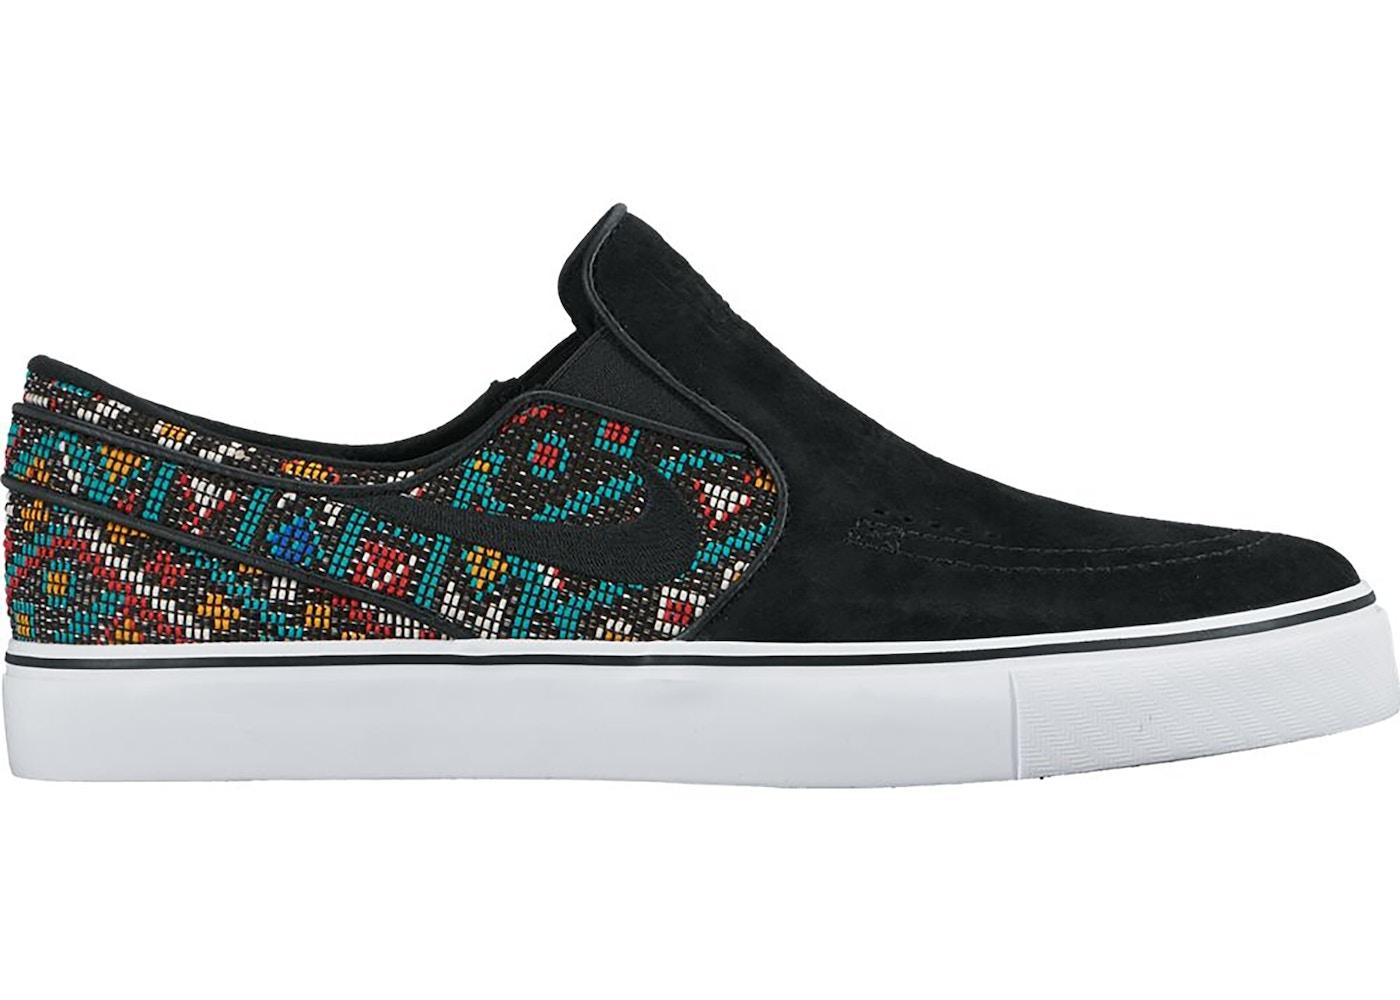 Nike SB Zoom Stefan Janoski Slip-On Elite Aztec - 844808-002